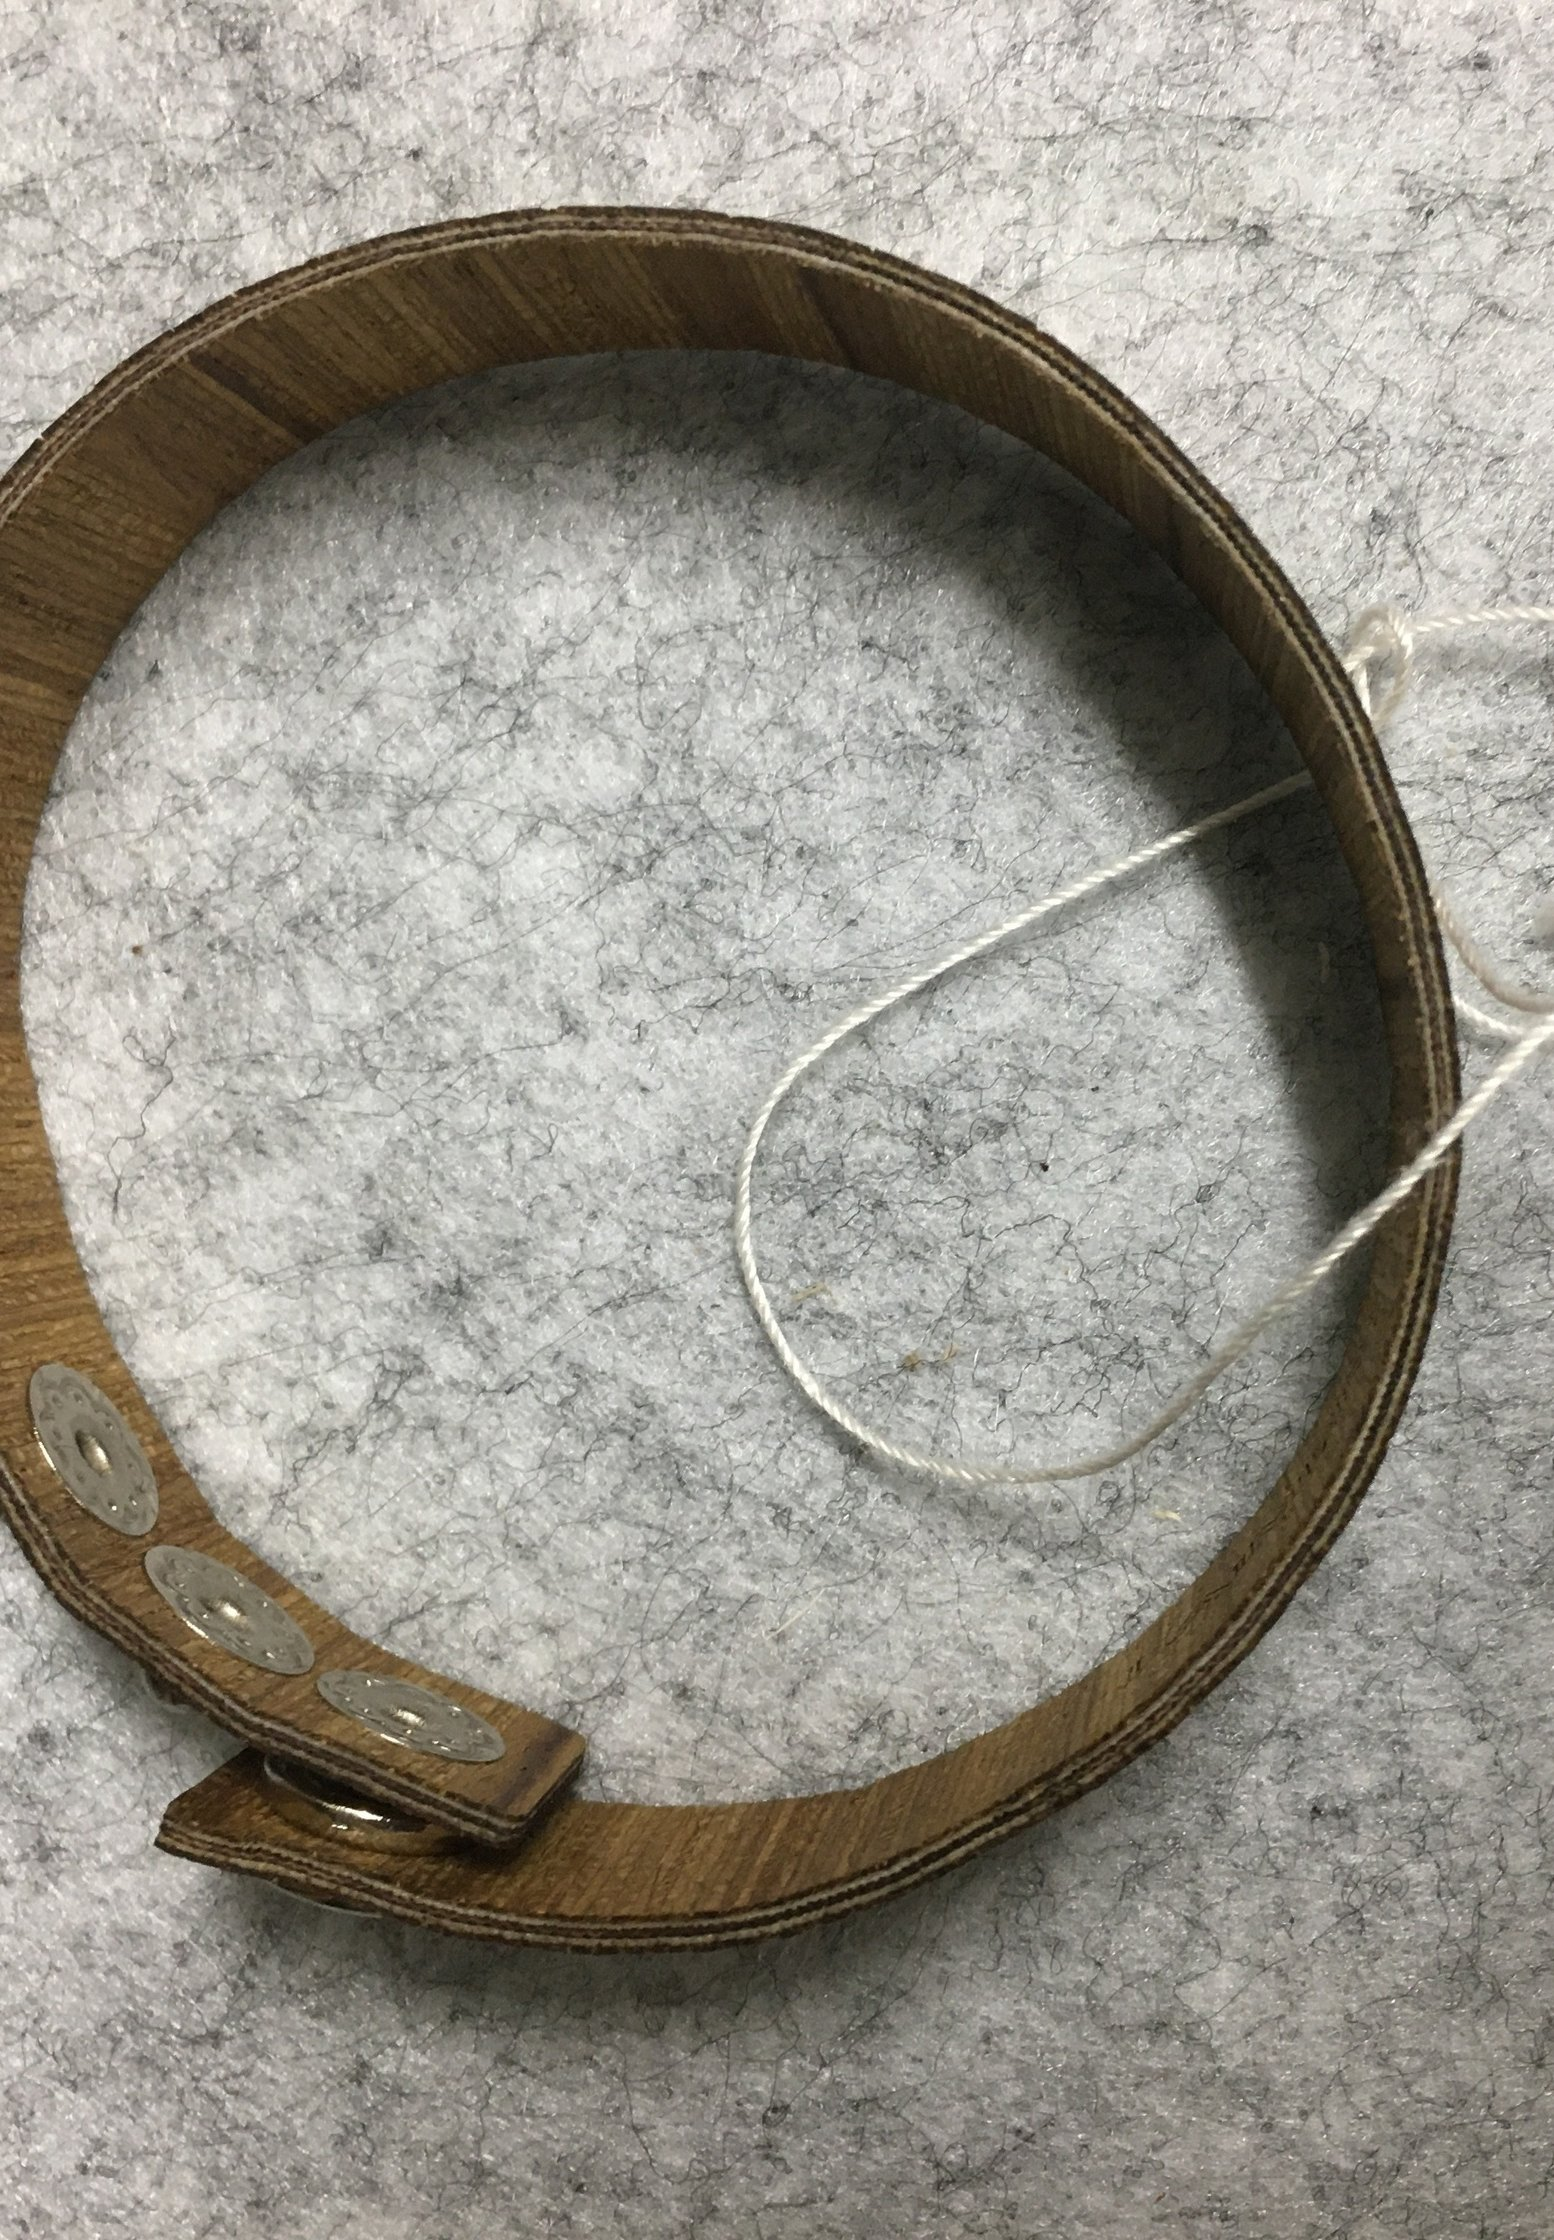 Homme LAIMER WICKEL-ARMBAND AUS ZEBRANOHOLZ - S1114 - Bracelet